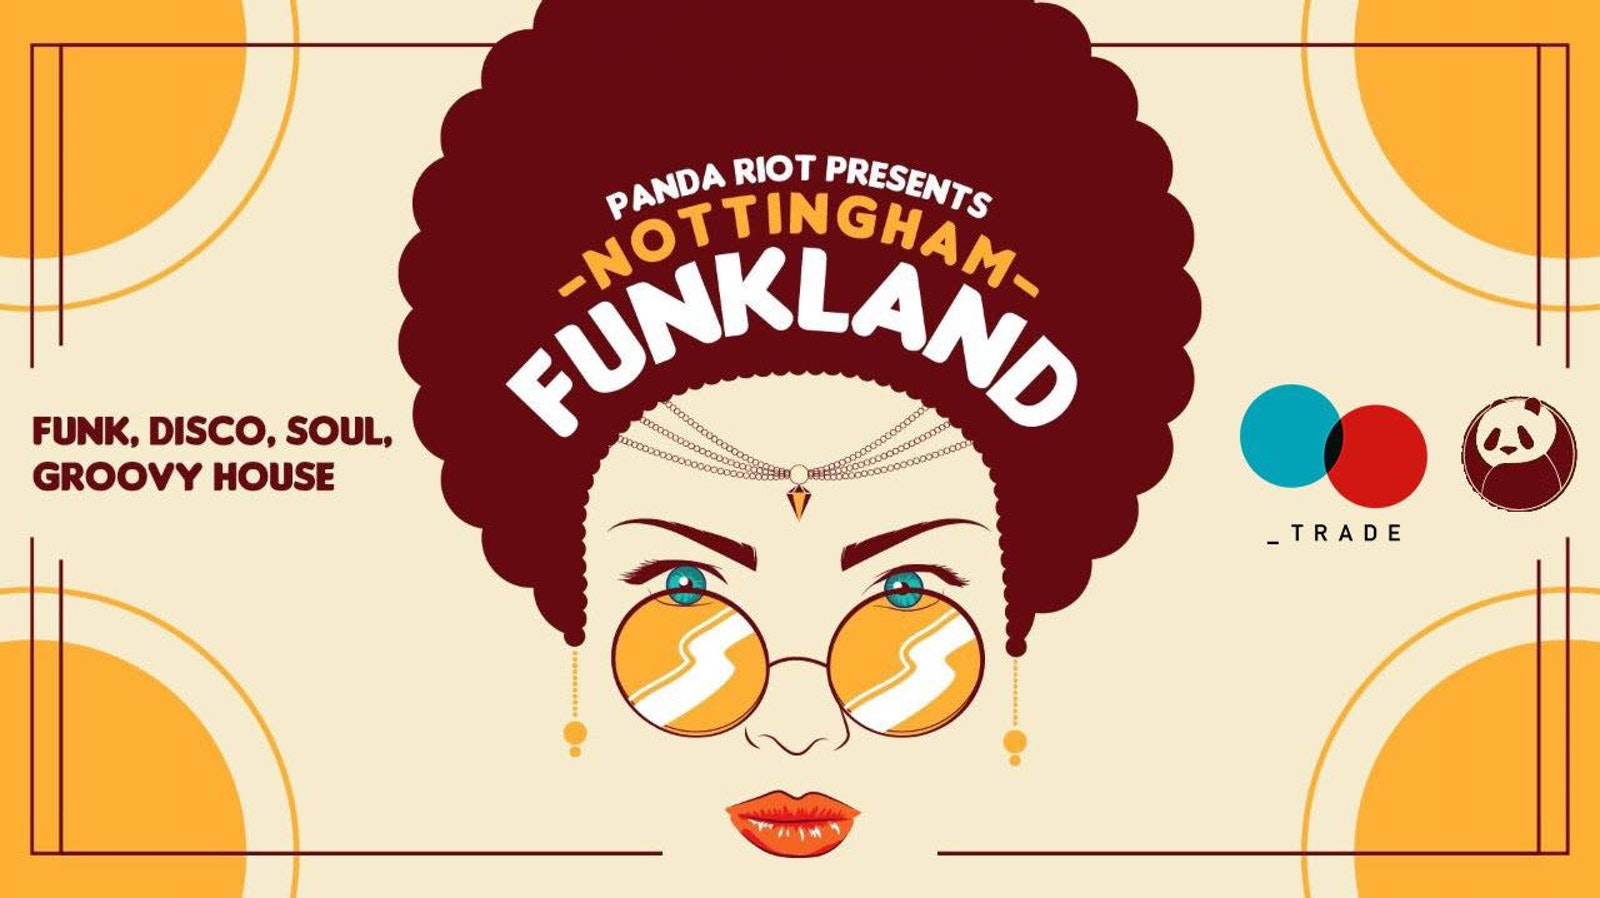 Panda Riot: Nottingham Freshers Funkland